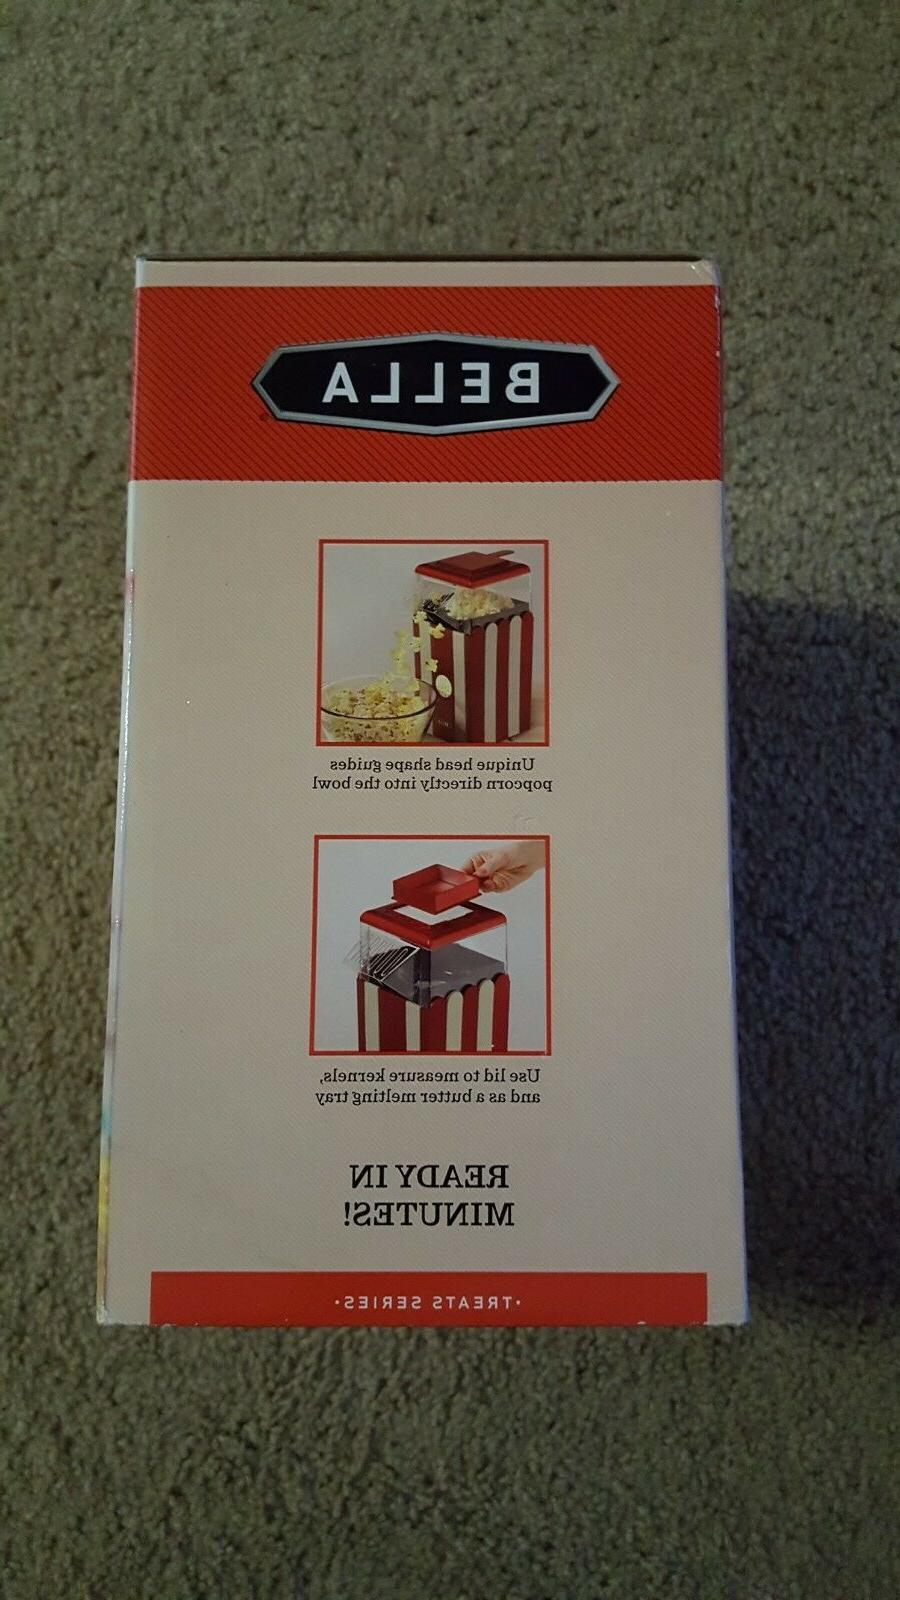 Bella 13554 Popcorn Maker Hot Air - BRAND NEW!